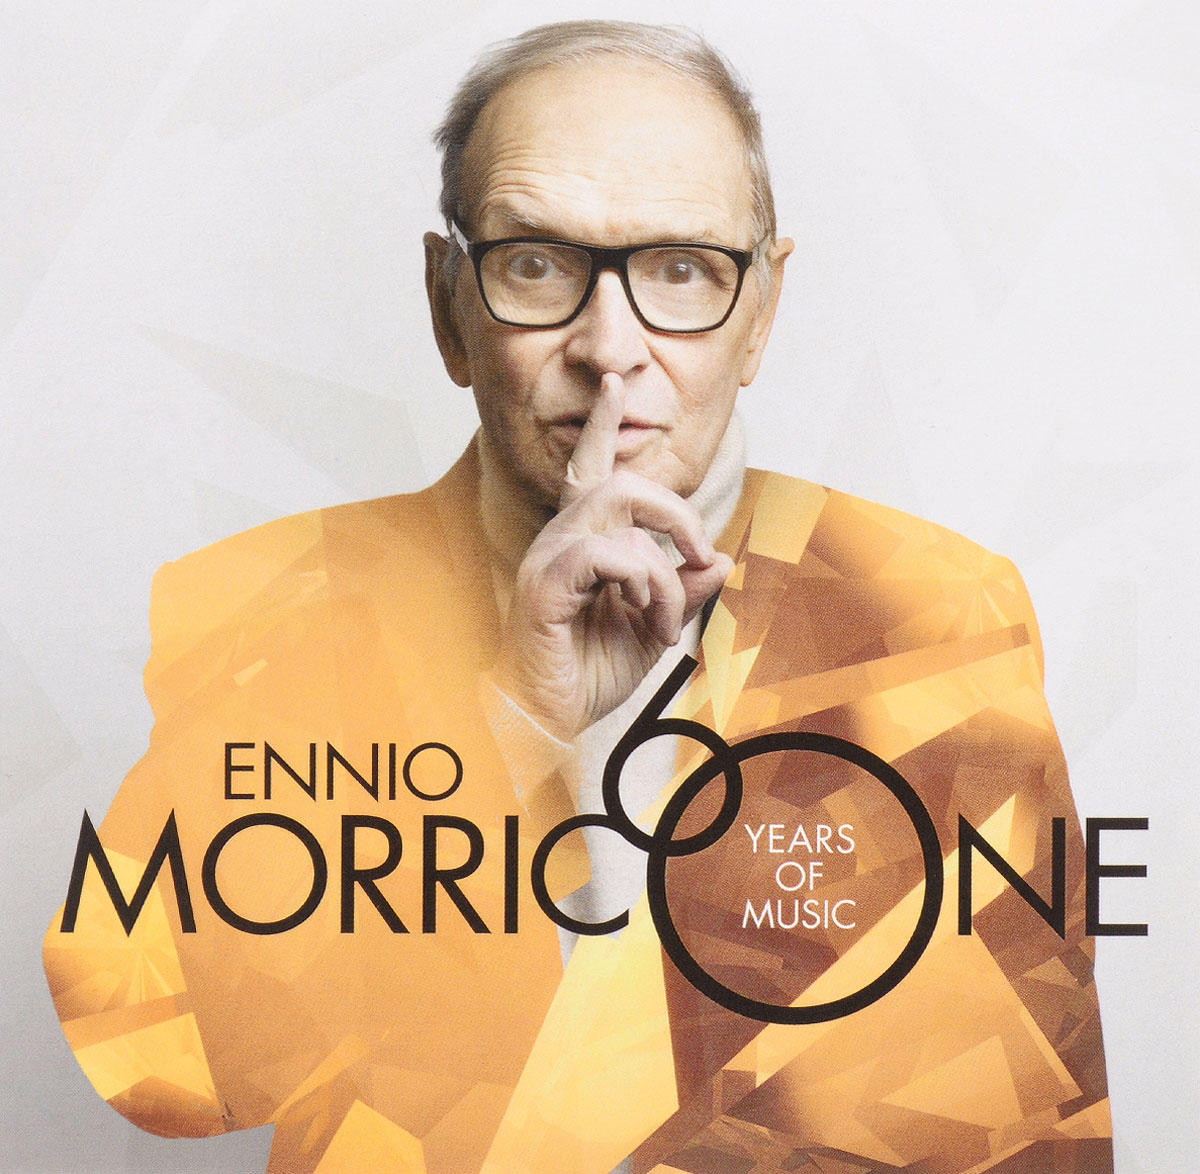 Эннио Морриконе Ennio Morricone. Morricone 60 Years Of Music (CD + DVD)